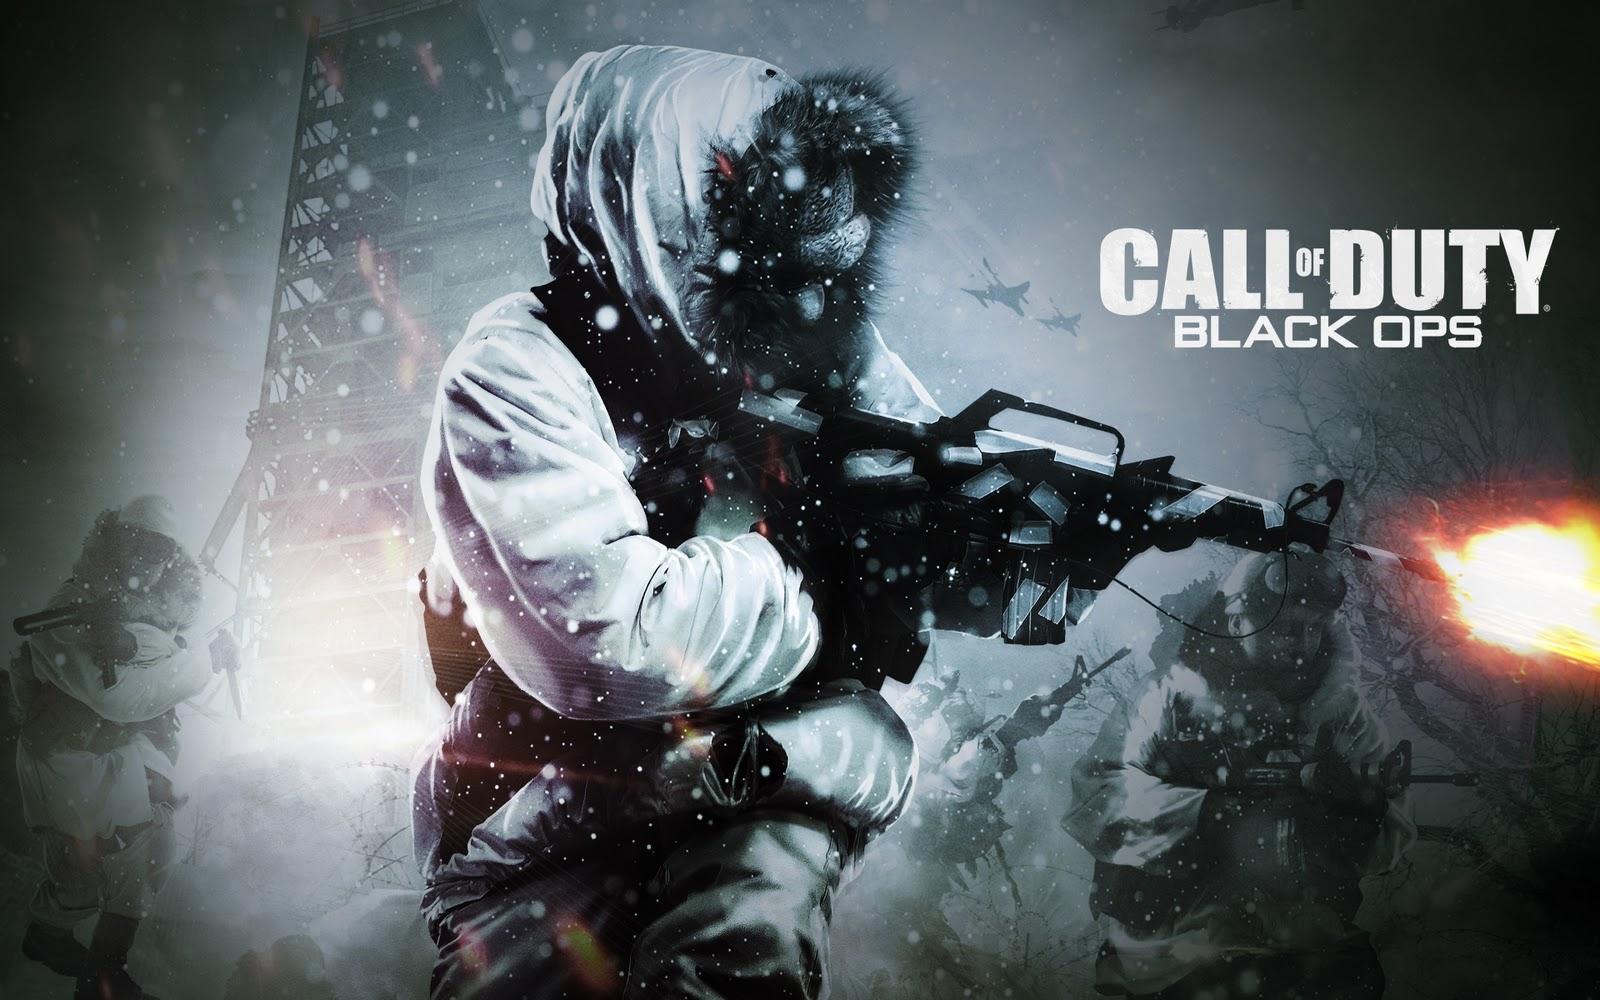 http://2.bp.blogspot.com/-WkBMl0gldsg/TZXe2cEBV-I/AAAAAAAADQU/eq6lrzwpQ08/s1600/Call_of_Duty_Black_Ops_HD_Wallpapers_7.jpg